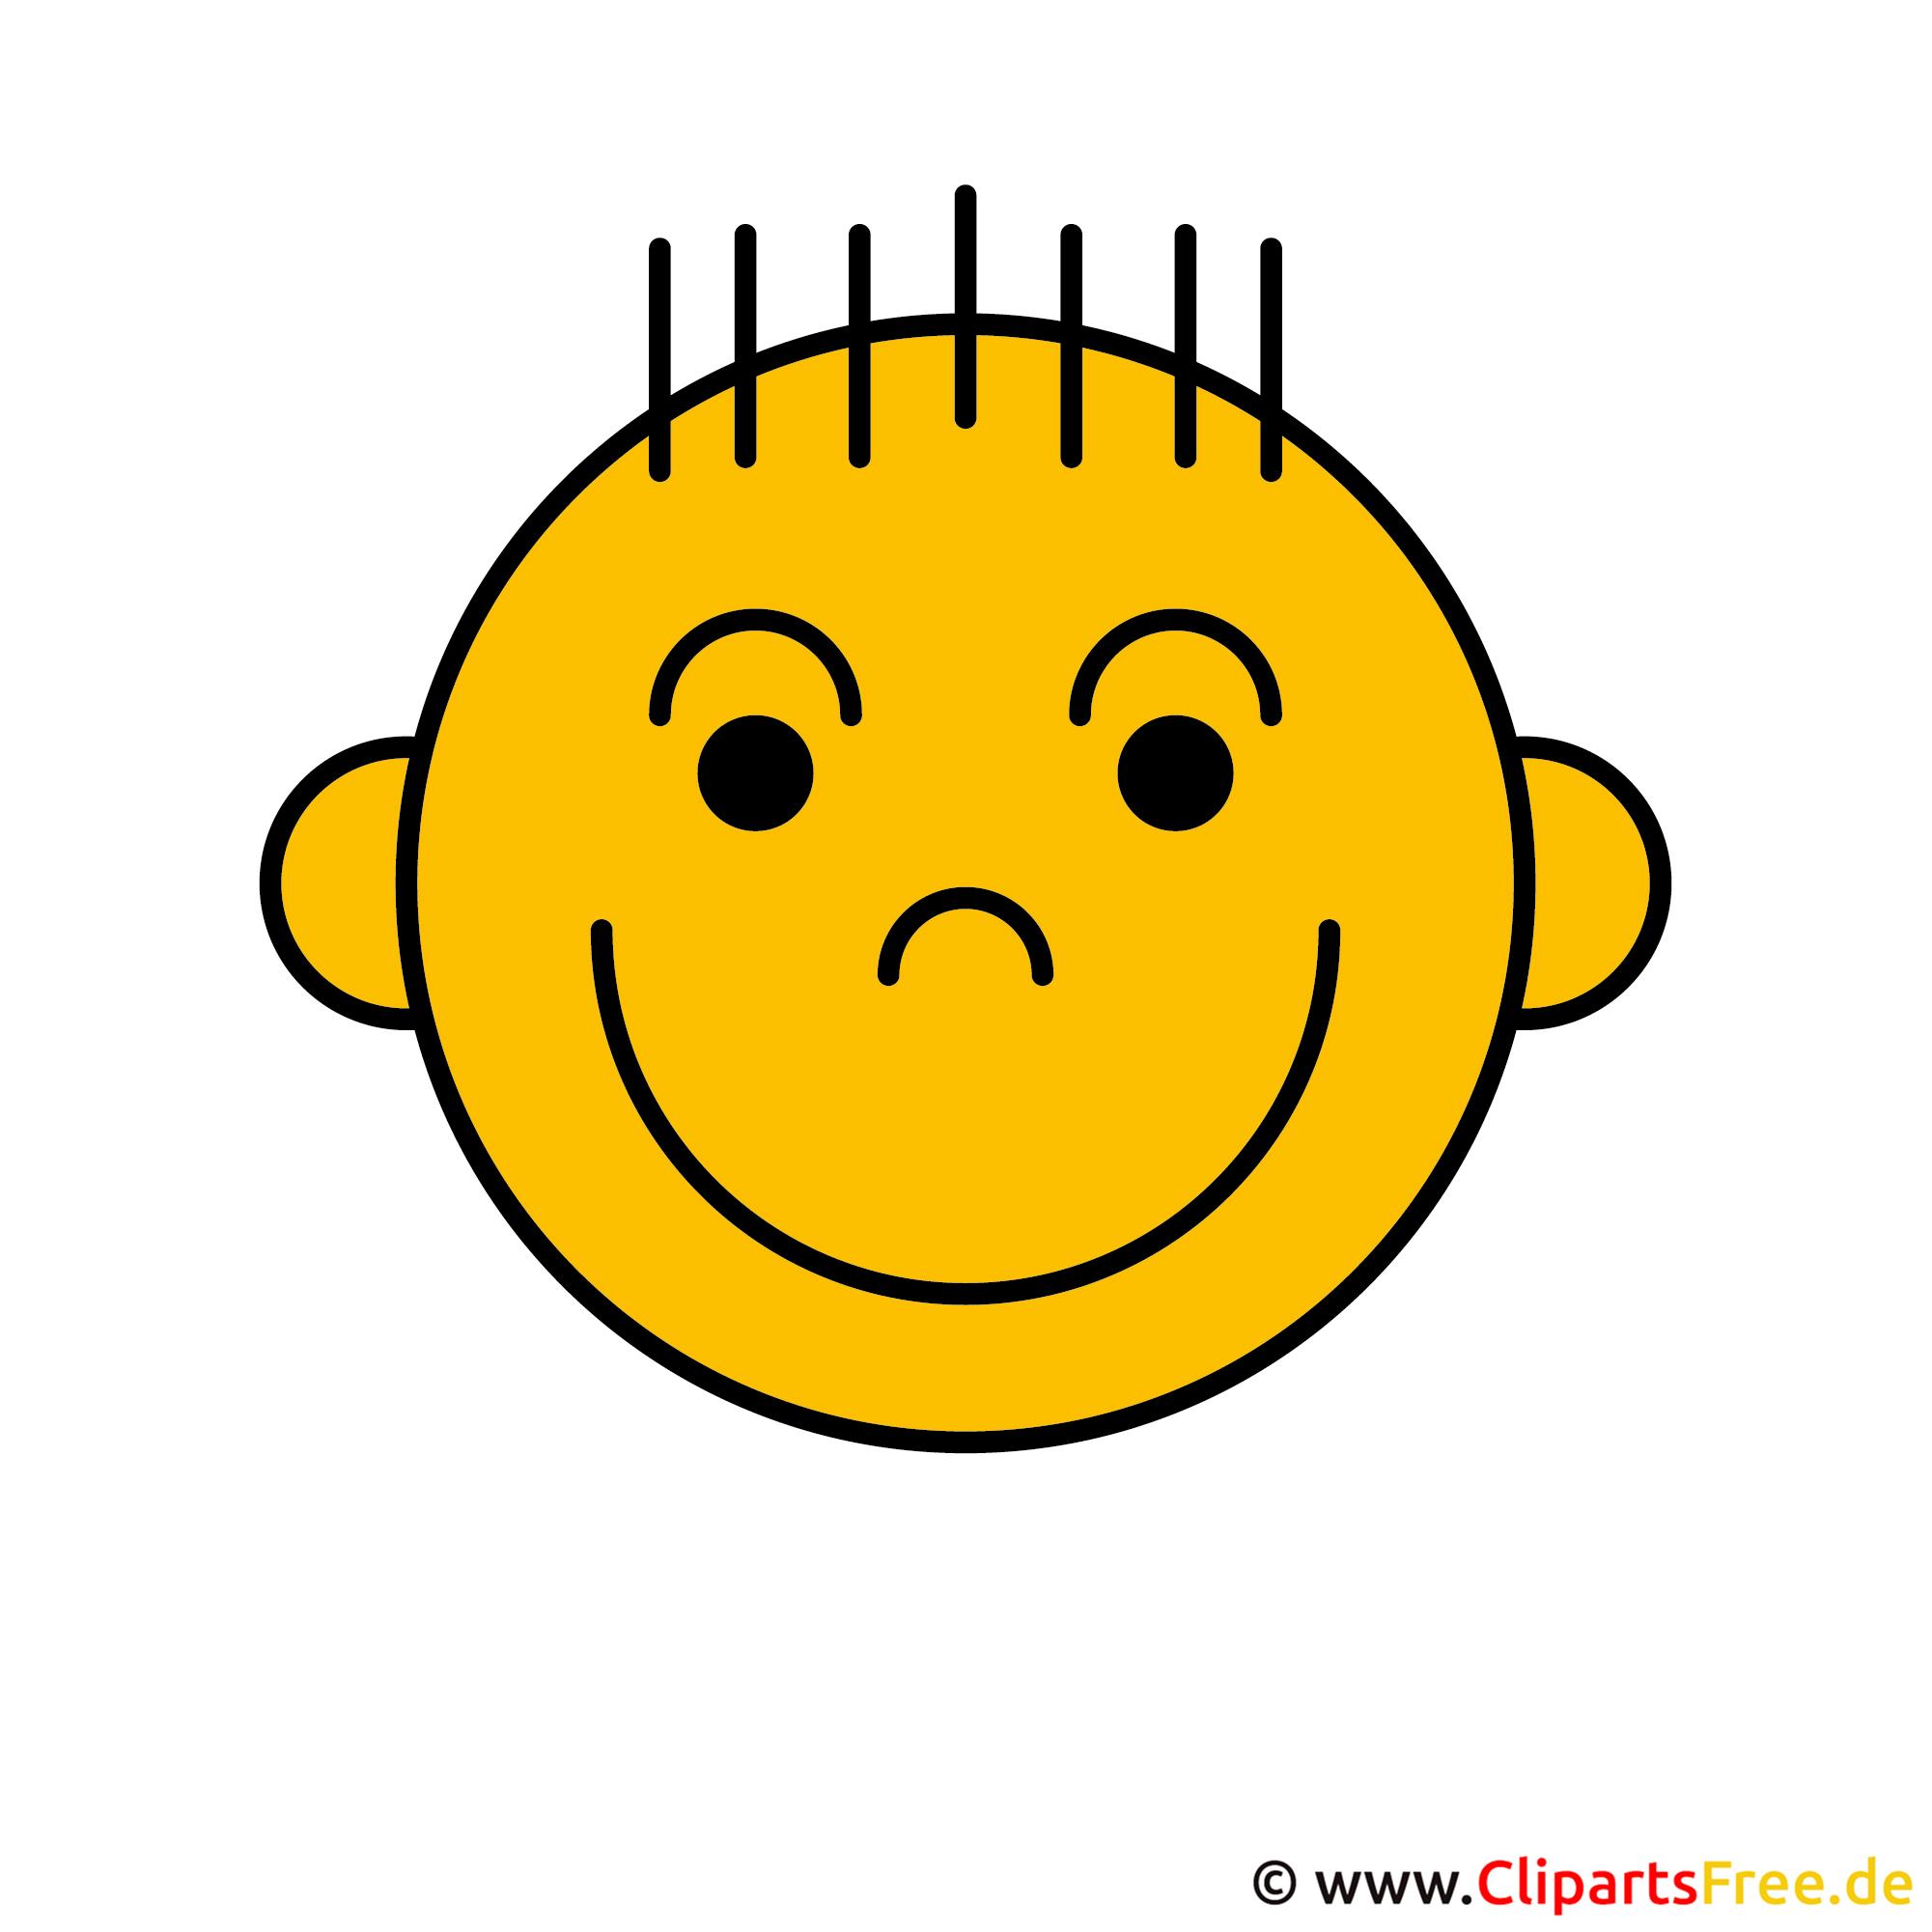 Smiley lachend